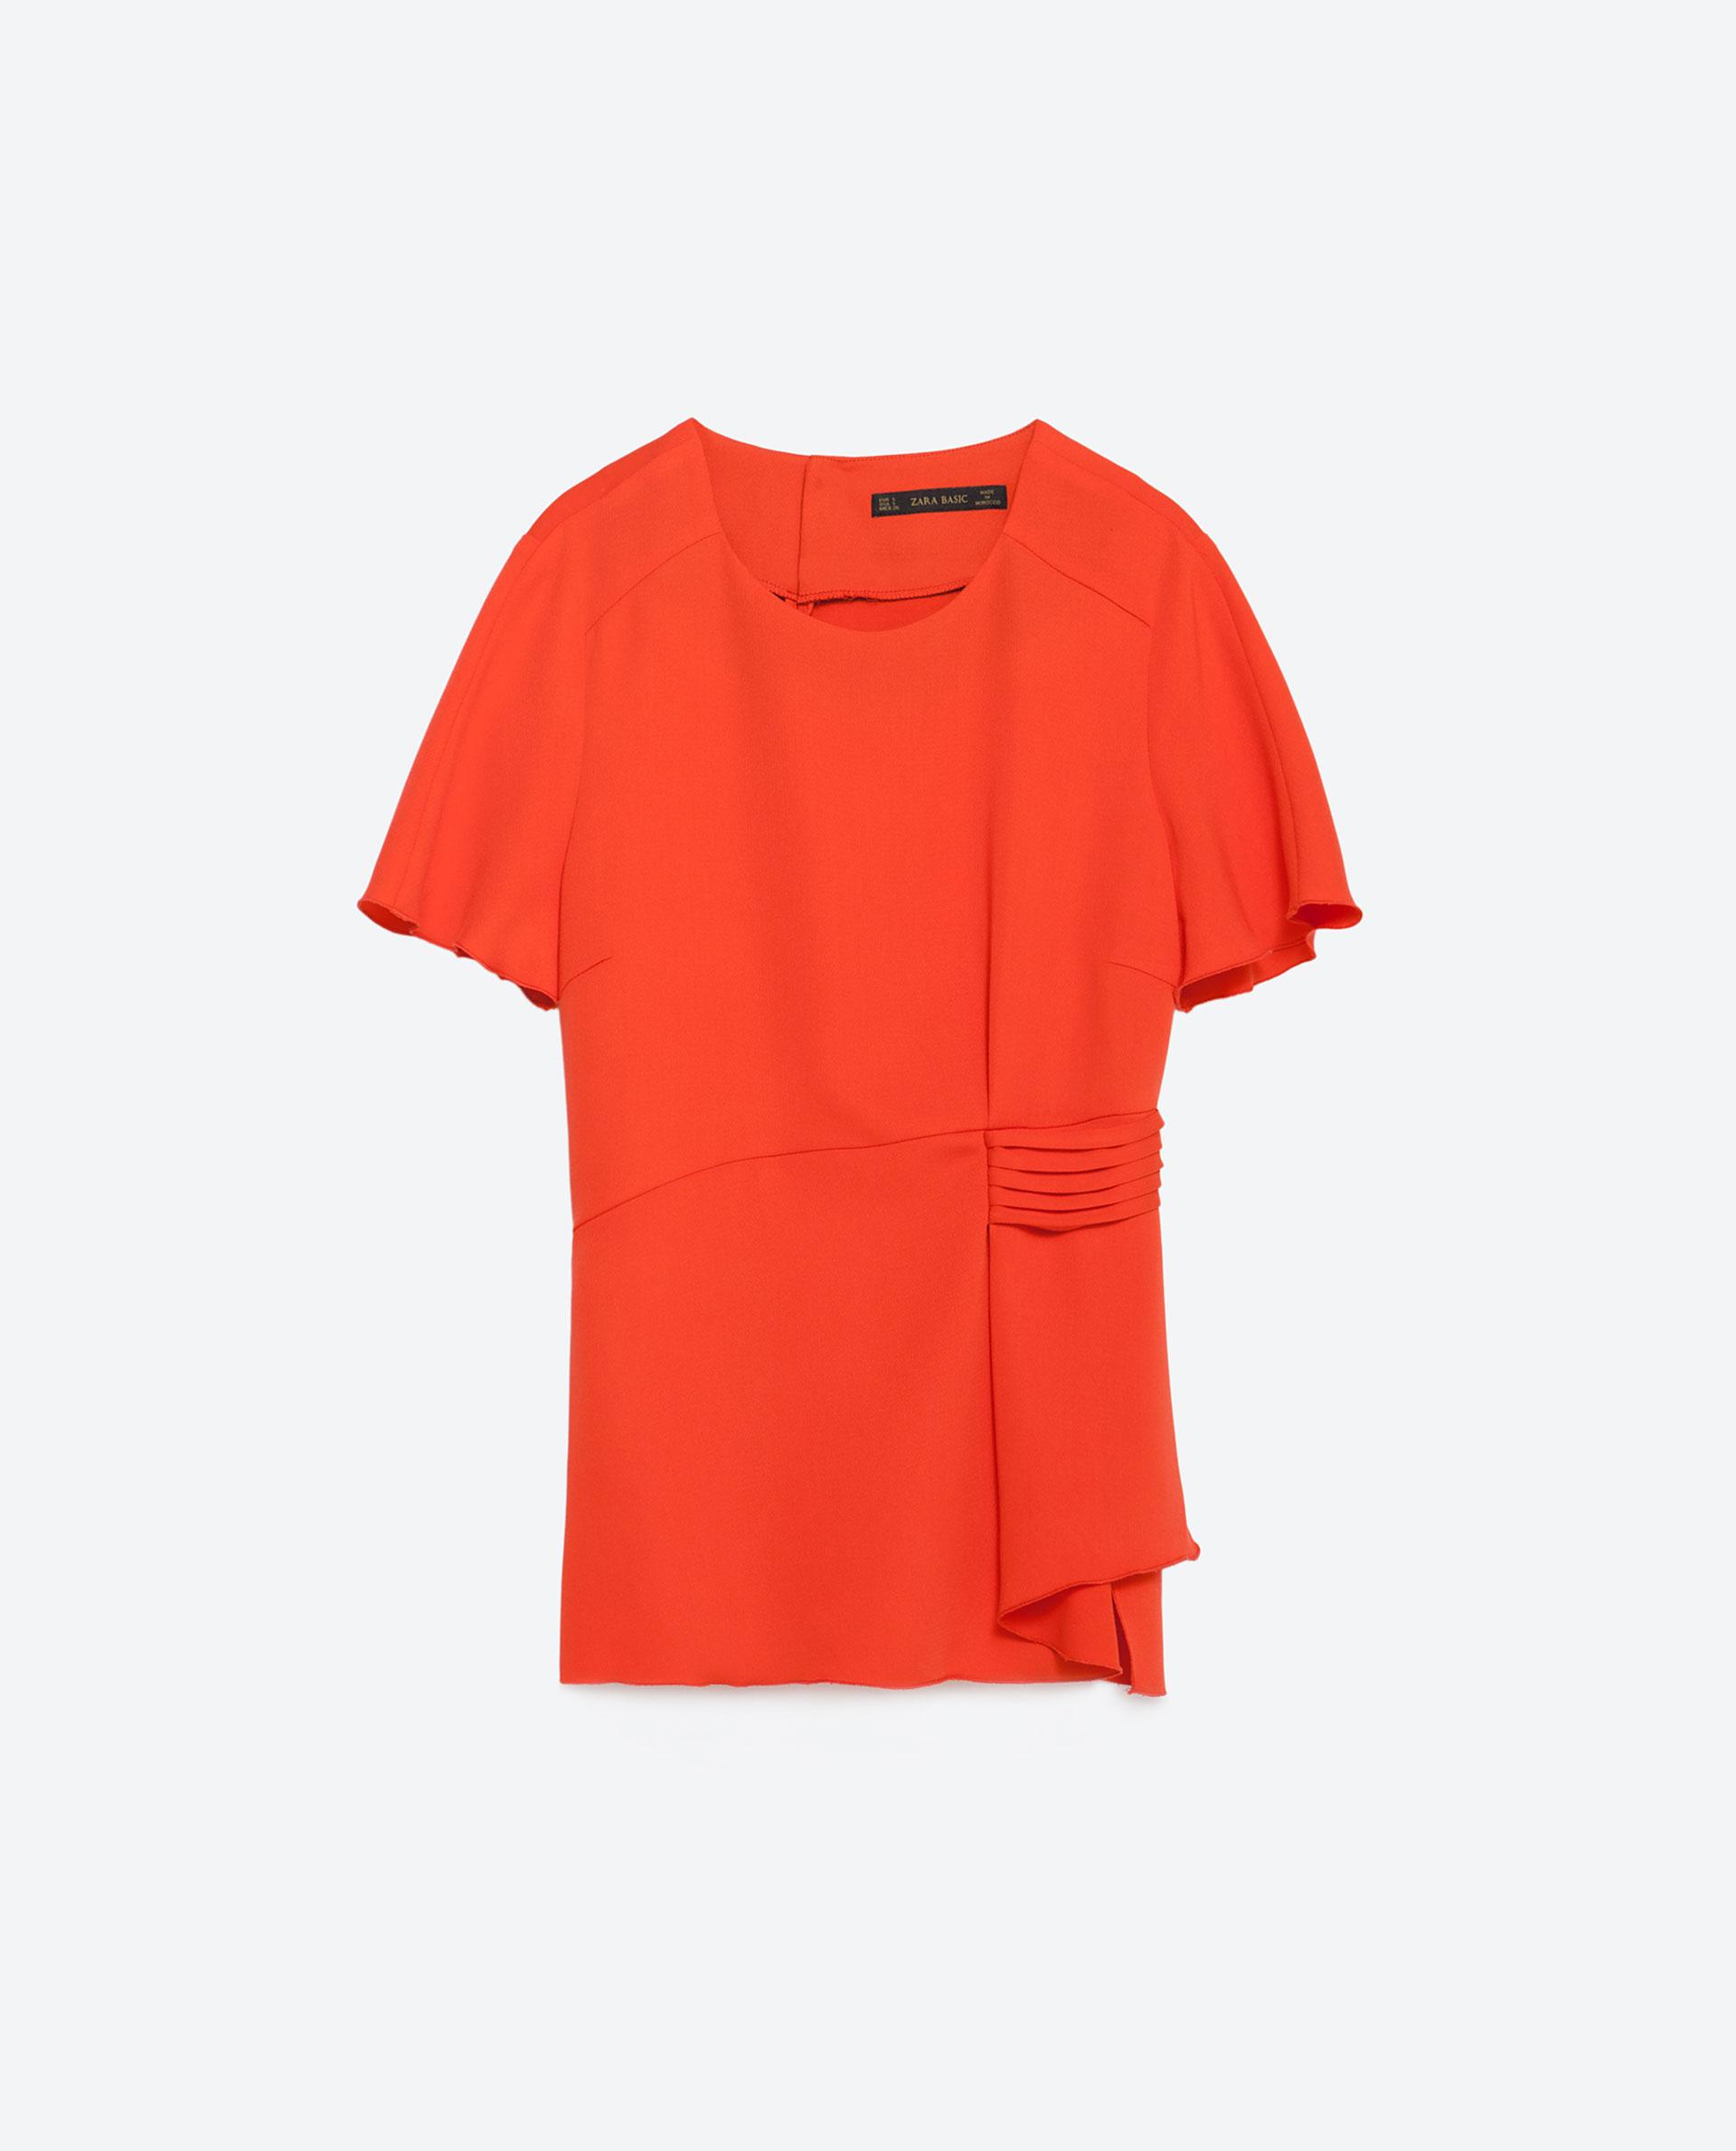 Zara Peplum Blouse 45